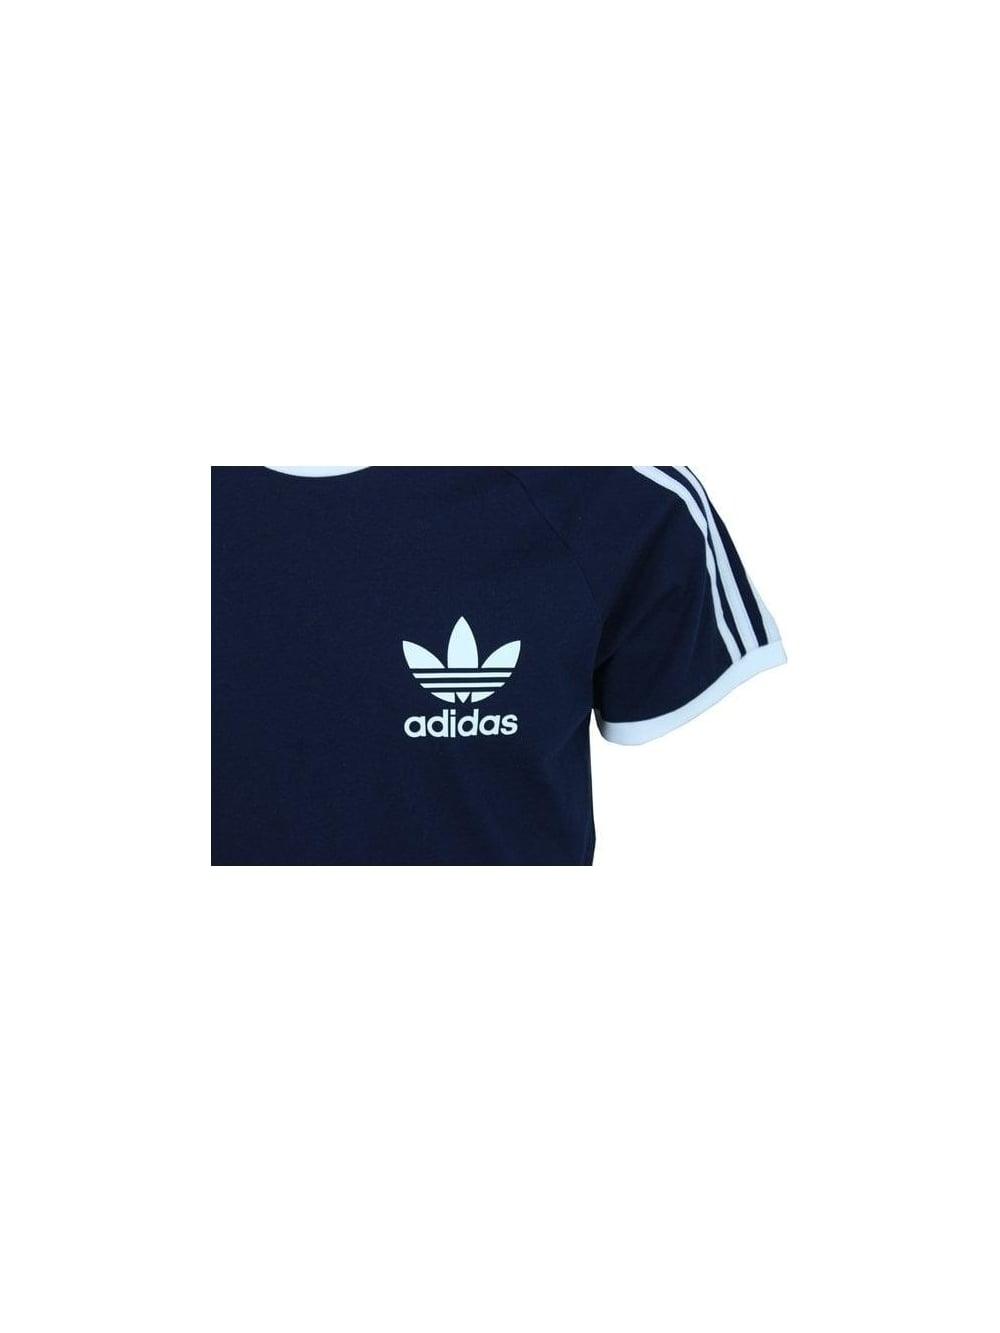 adidas Men's Blue Sport Essential Cotton Crew Neck Blue